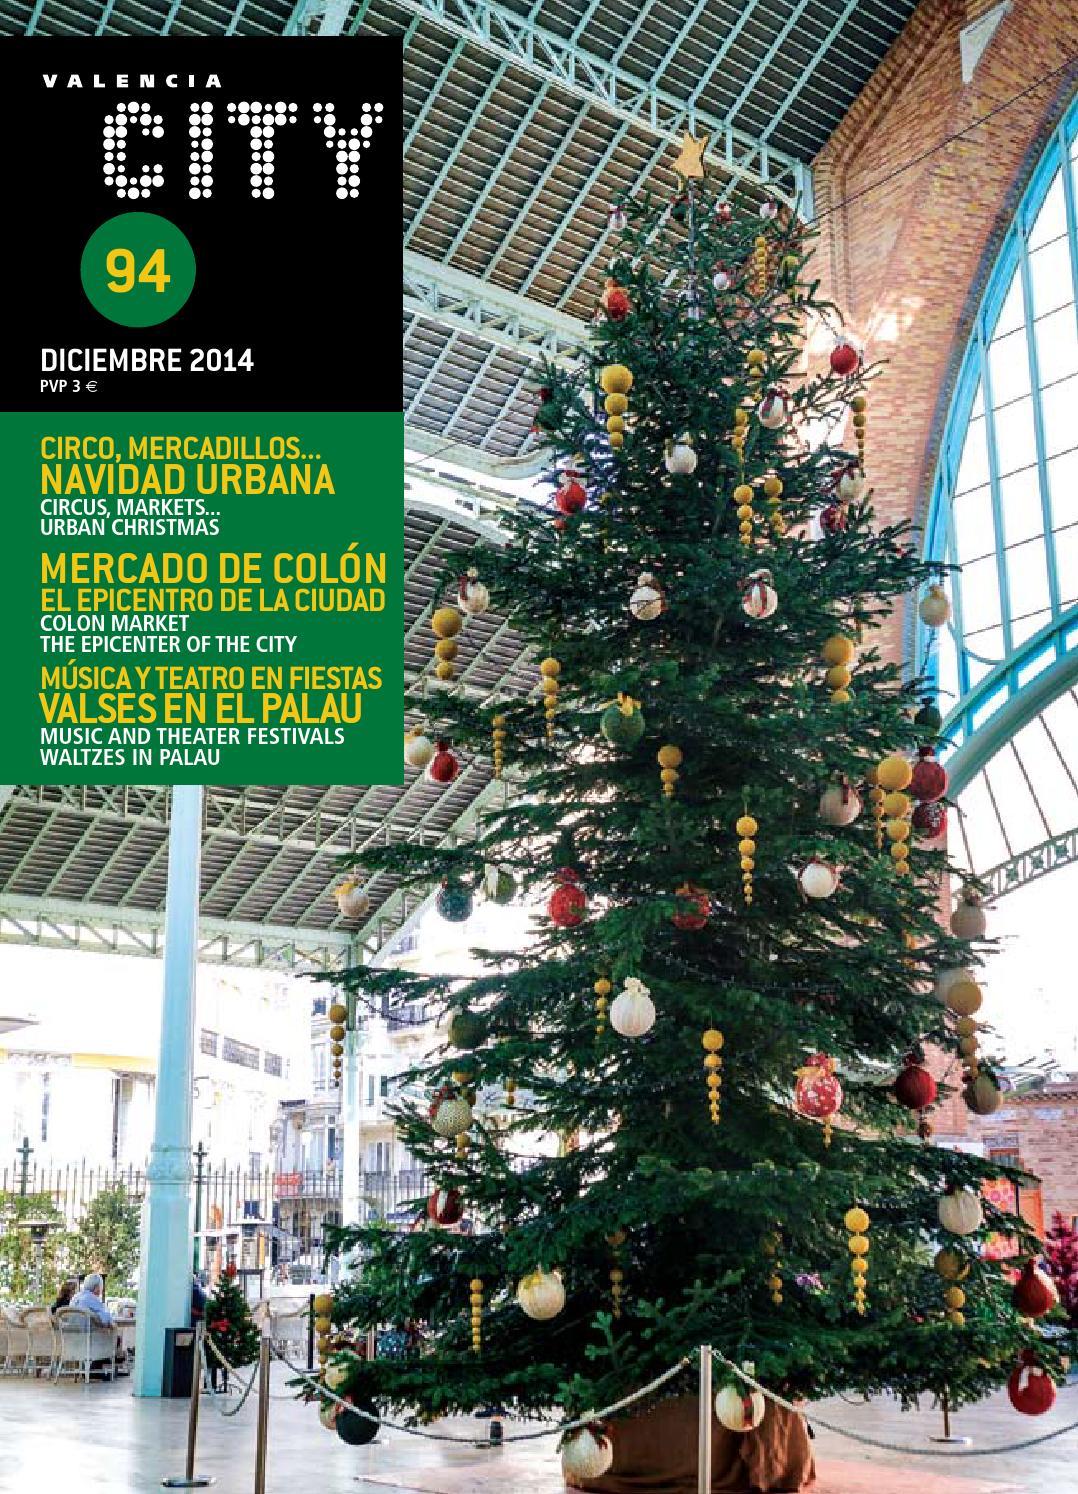 Valencia city diciembre 2014 num 94 by Valencia City - issuu